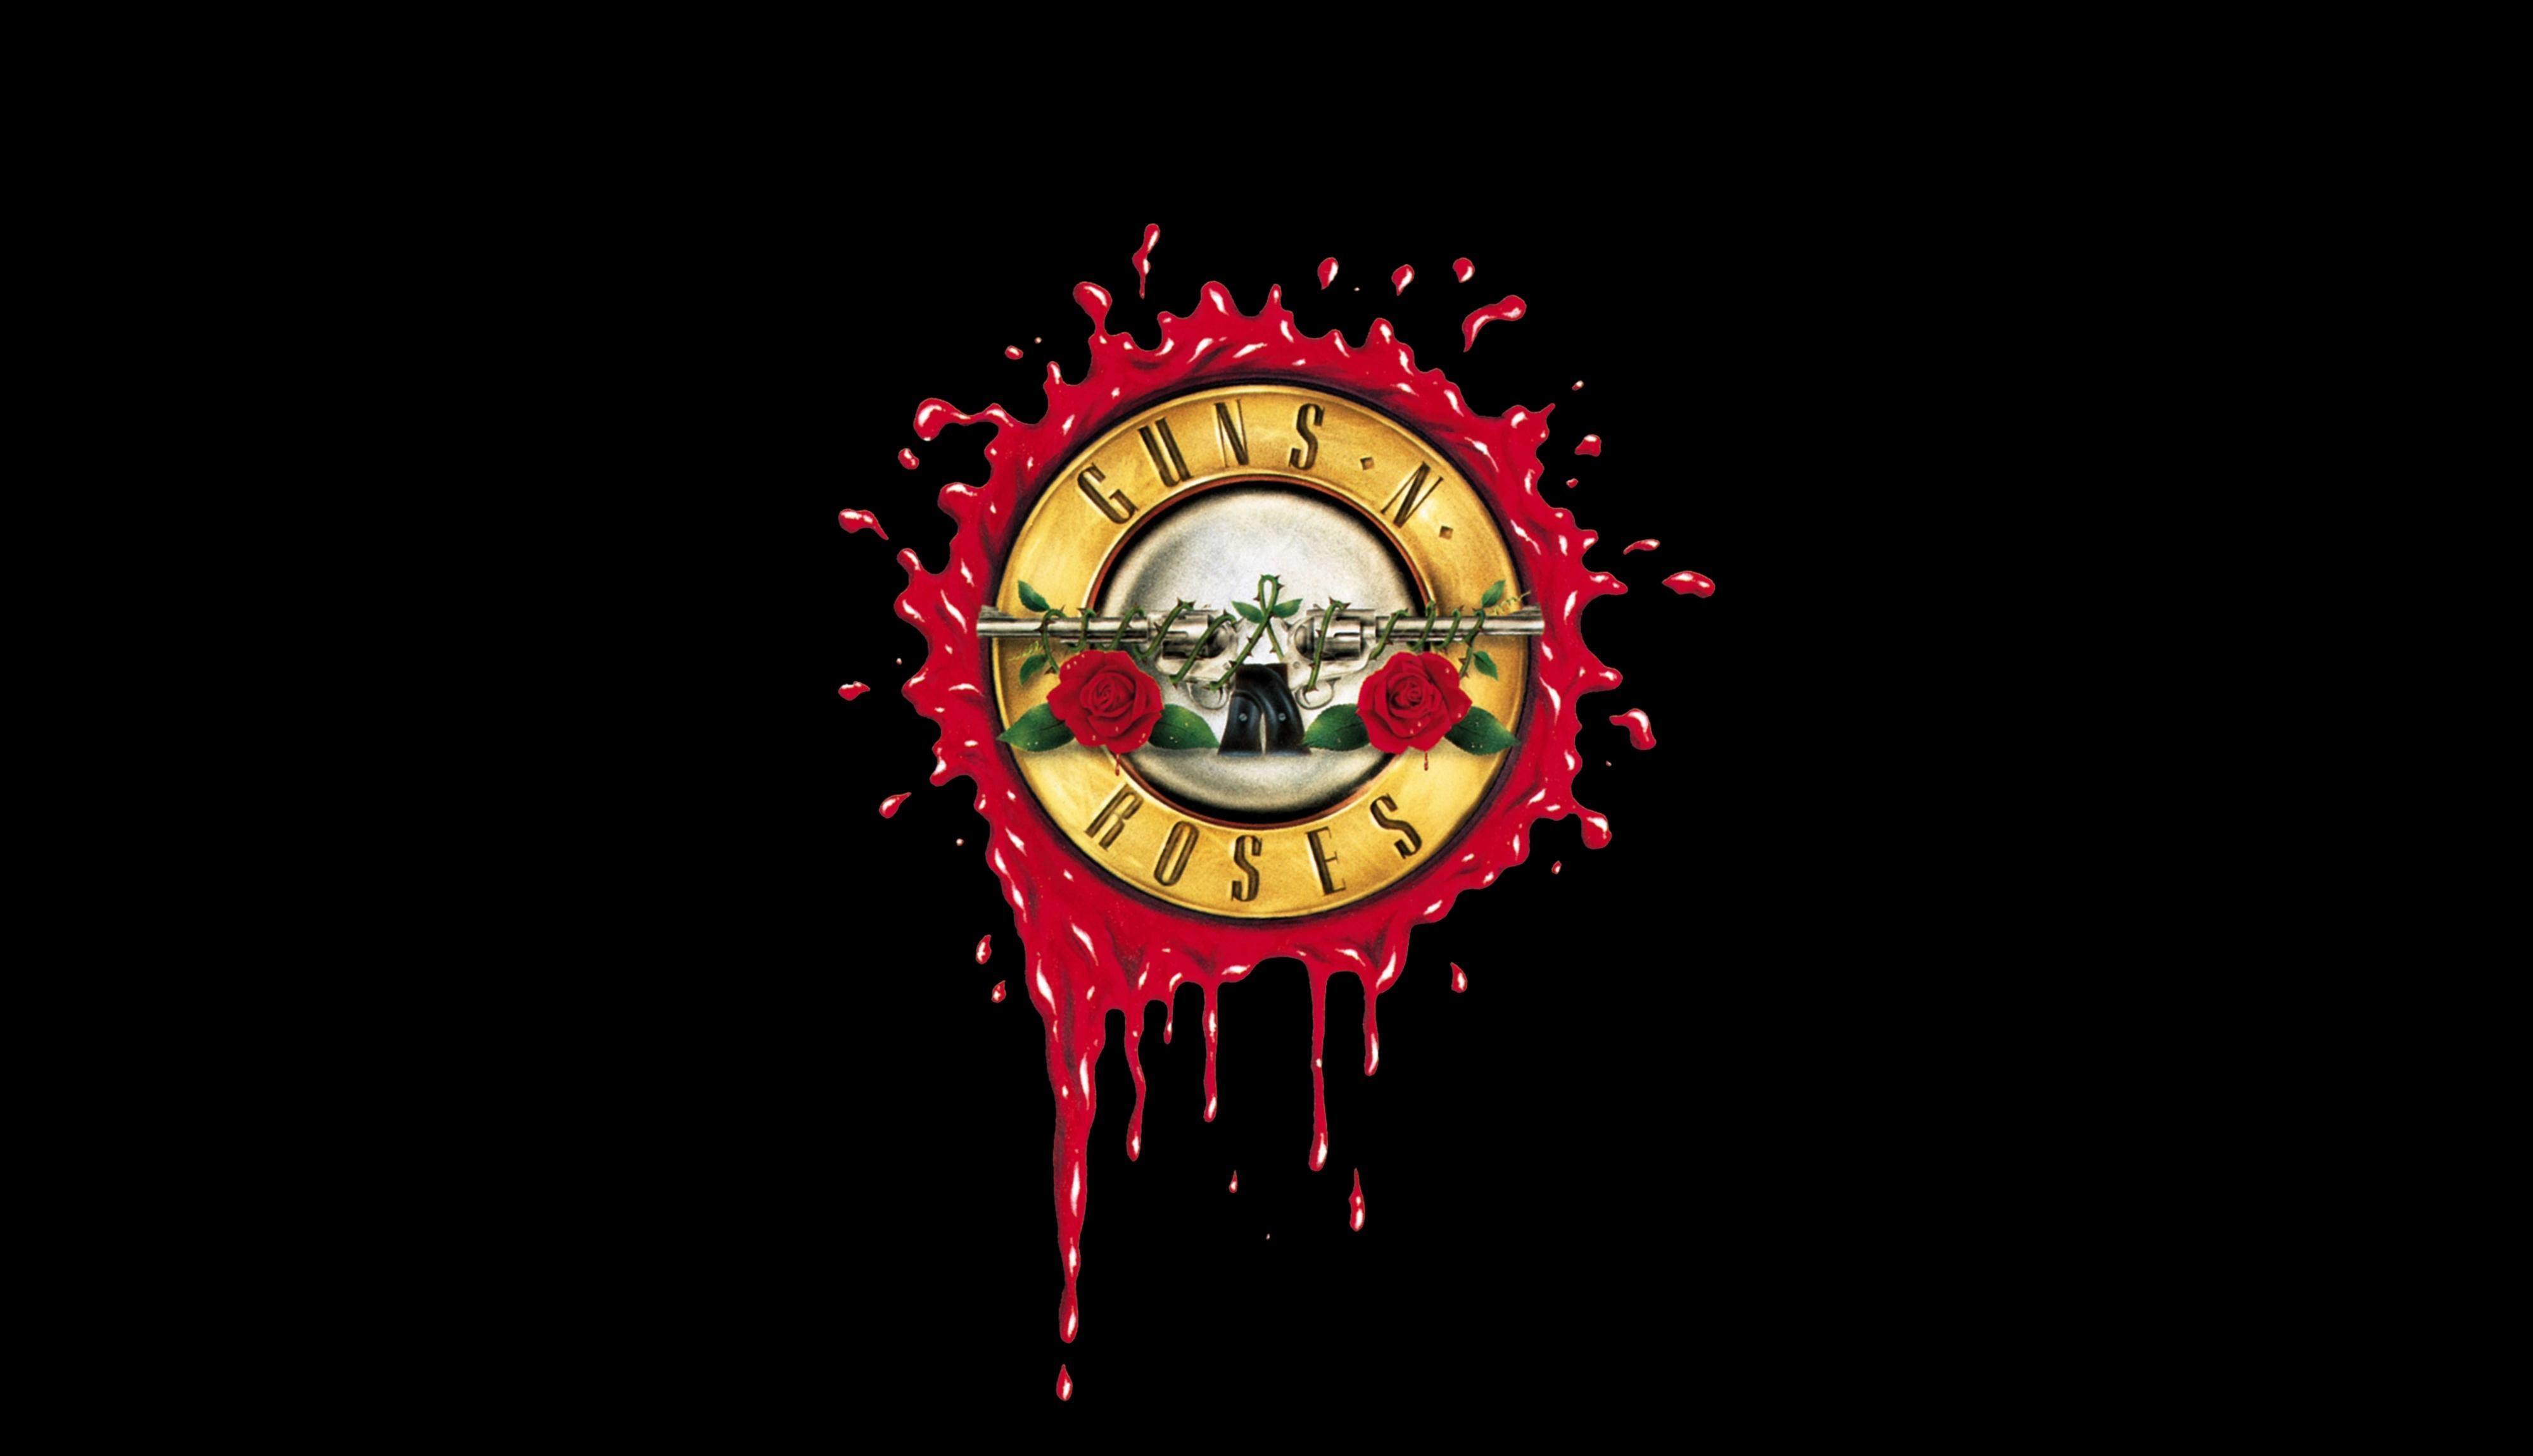 Fotos n roses slash iphone hd wallpaper - Axl Rose Plays Last Guns N Roses Show With Slash Until 2016 On This Date In 1993